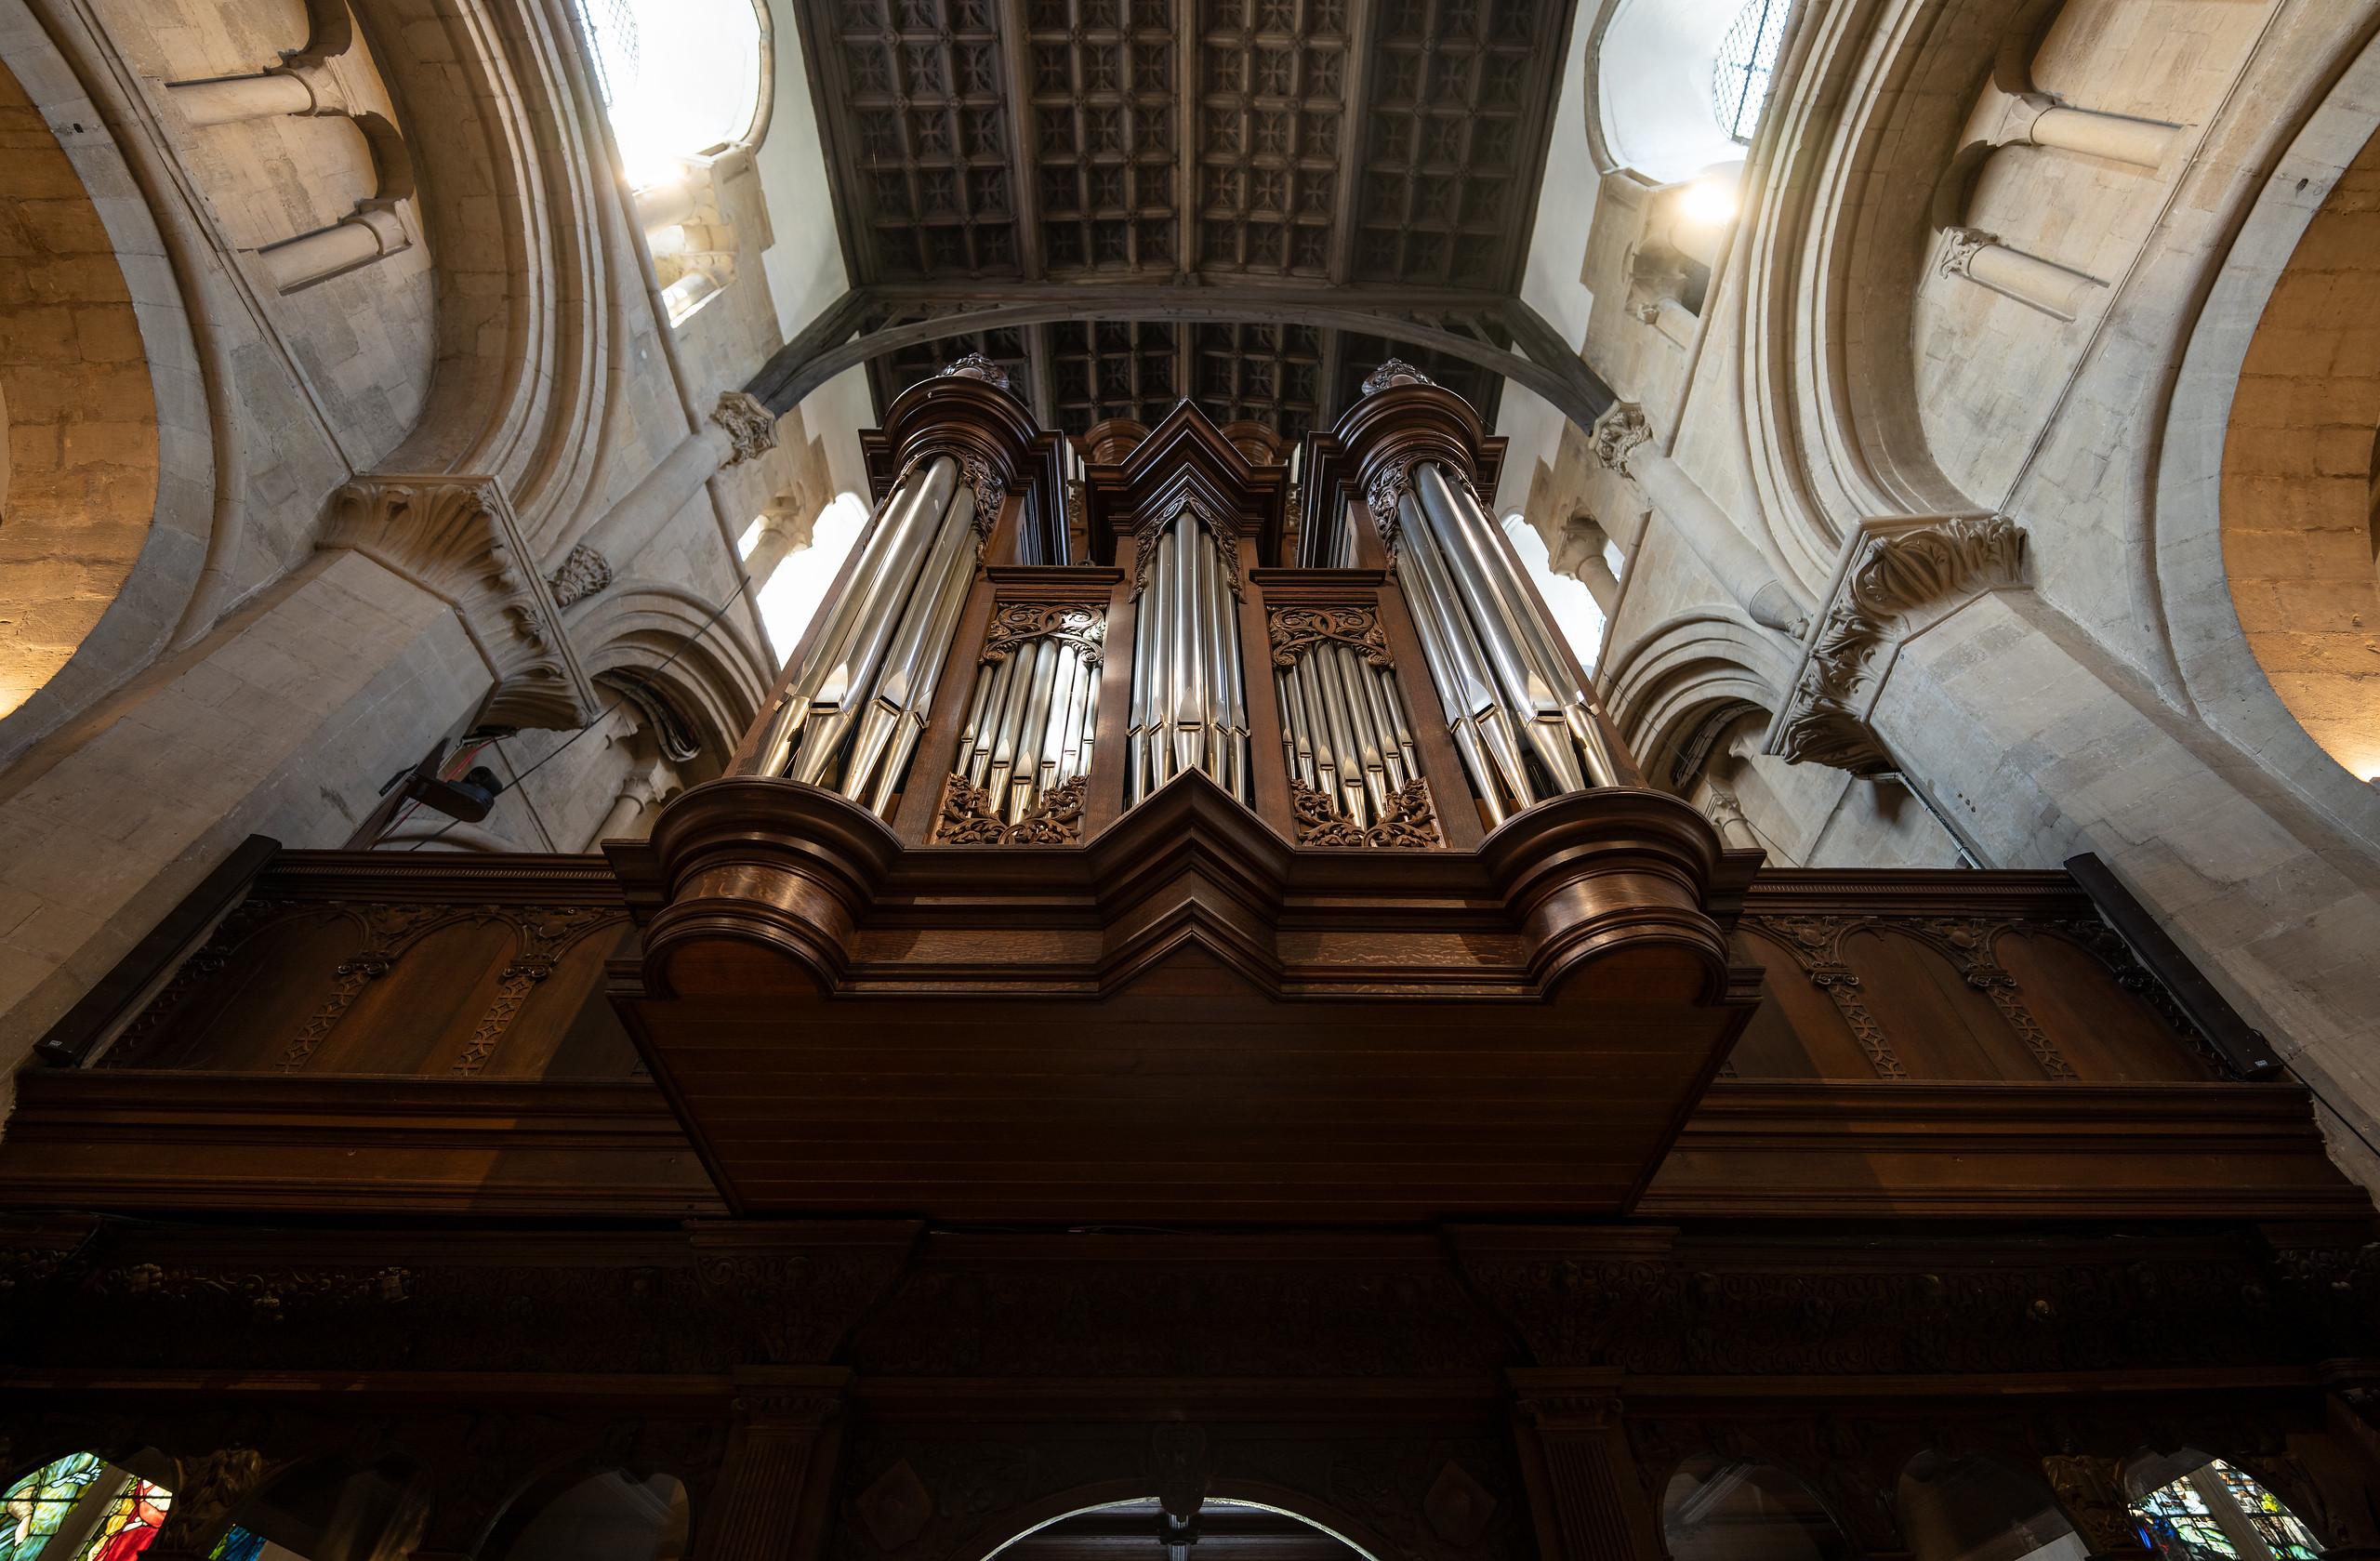 Organ Cathedral at Christ Church, Oxford University